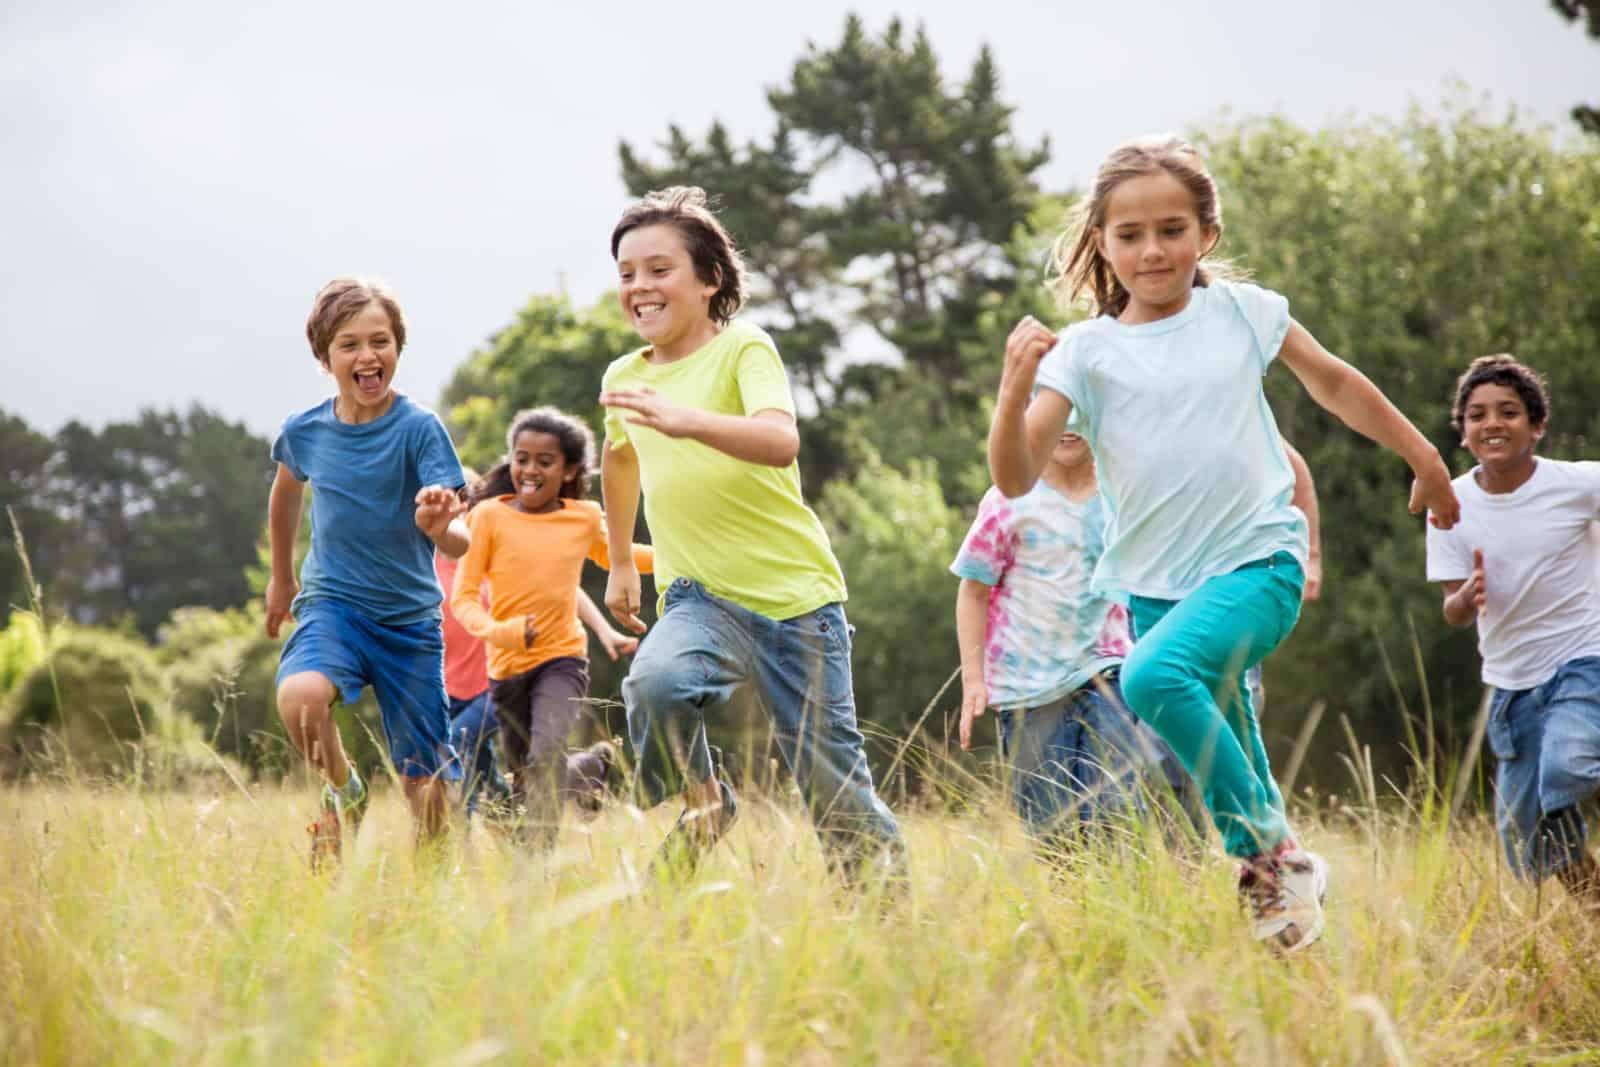 Children running together in a park